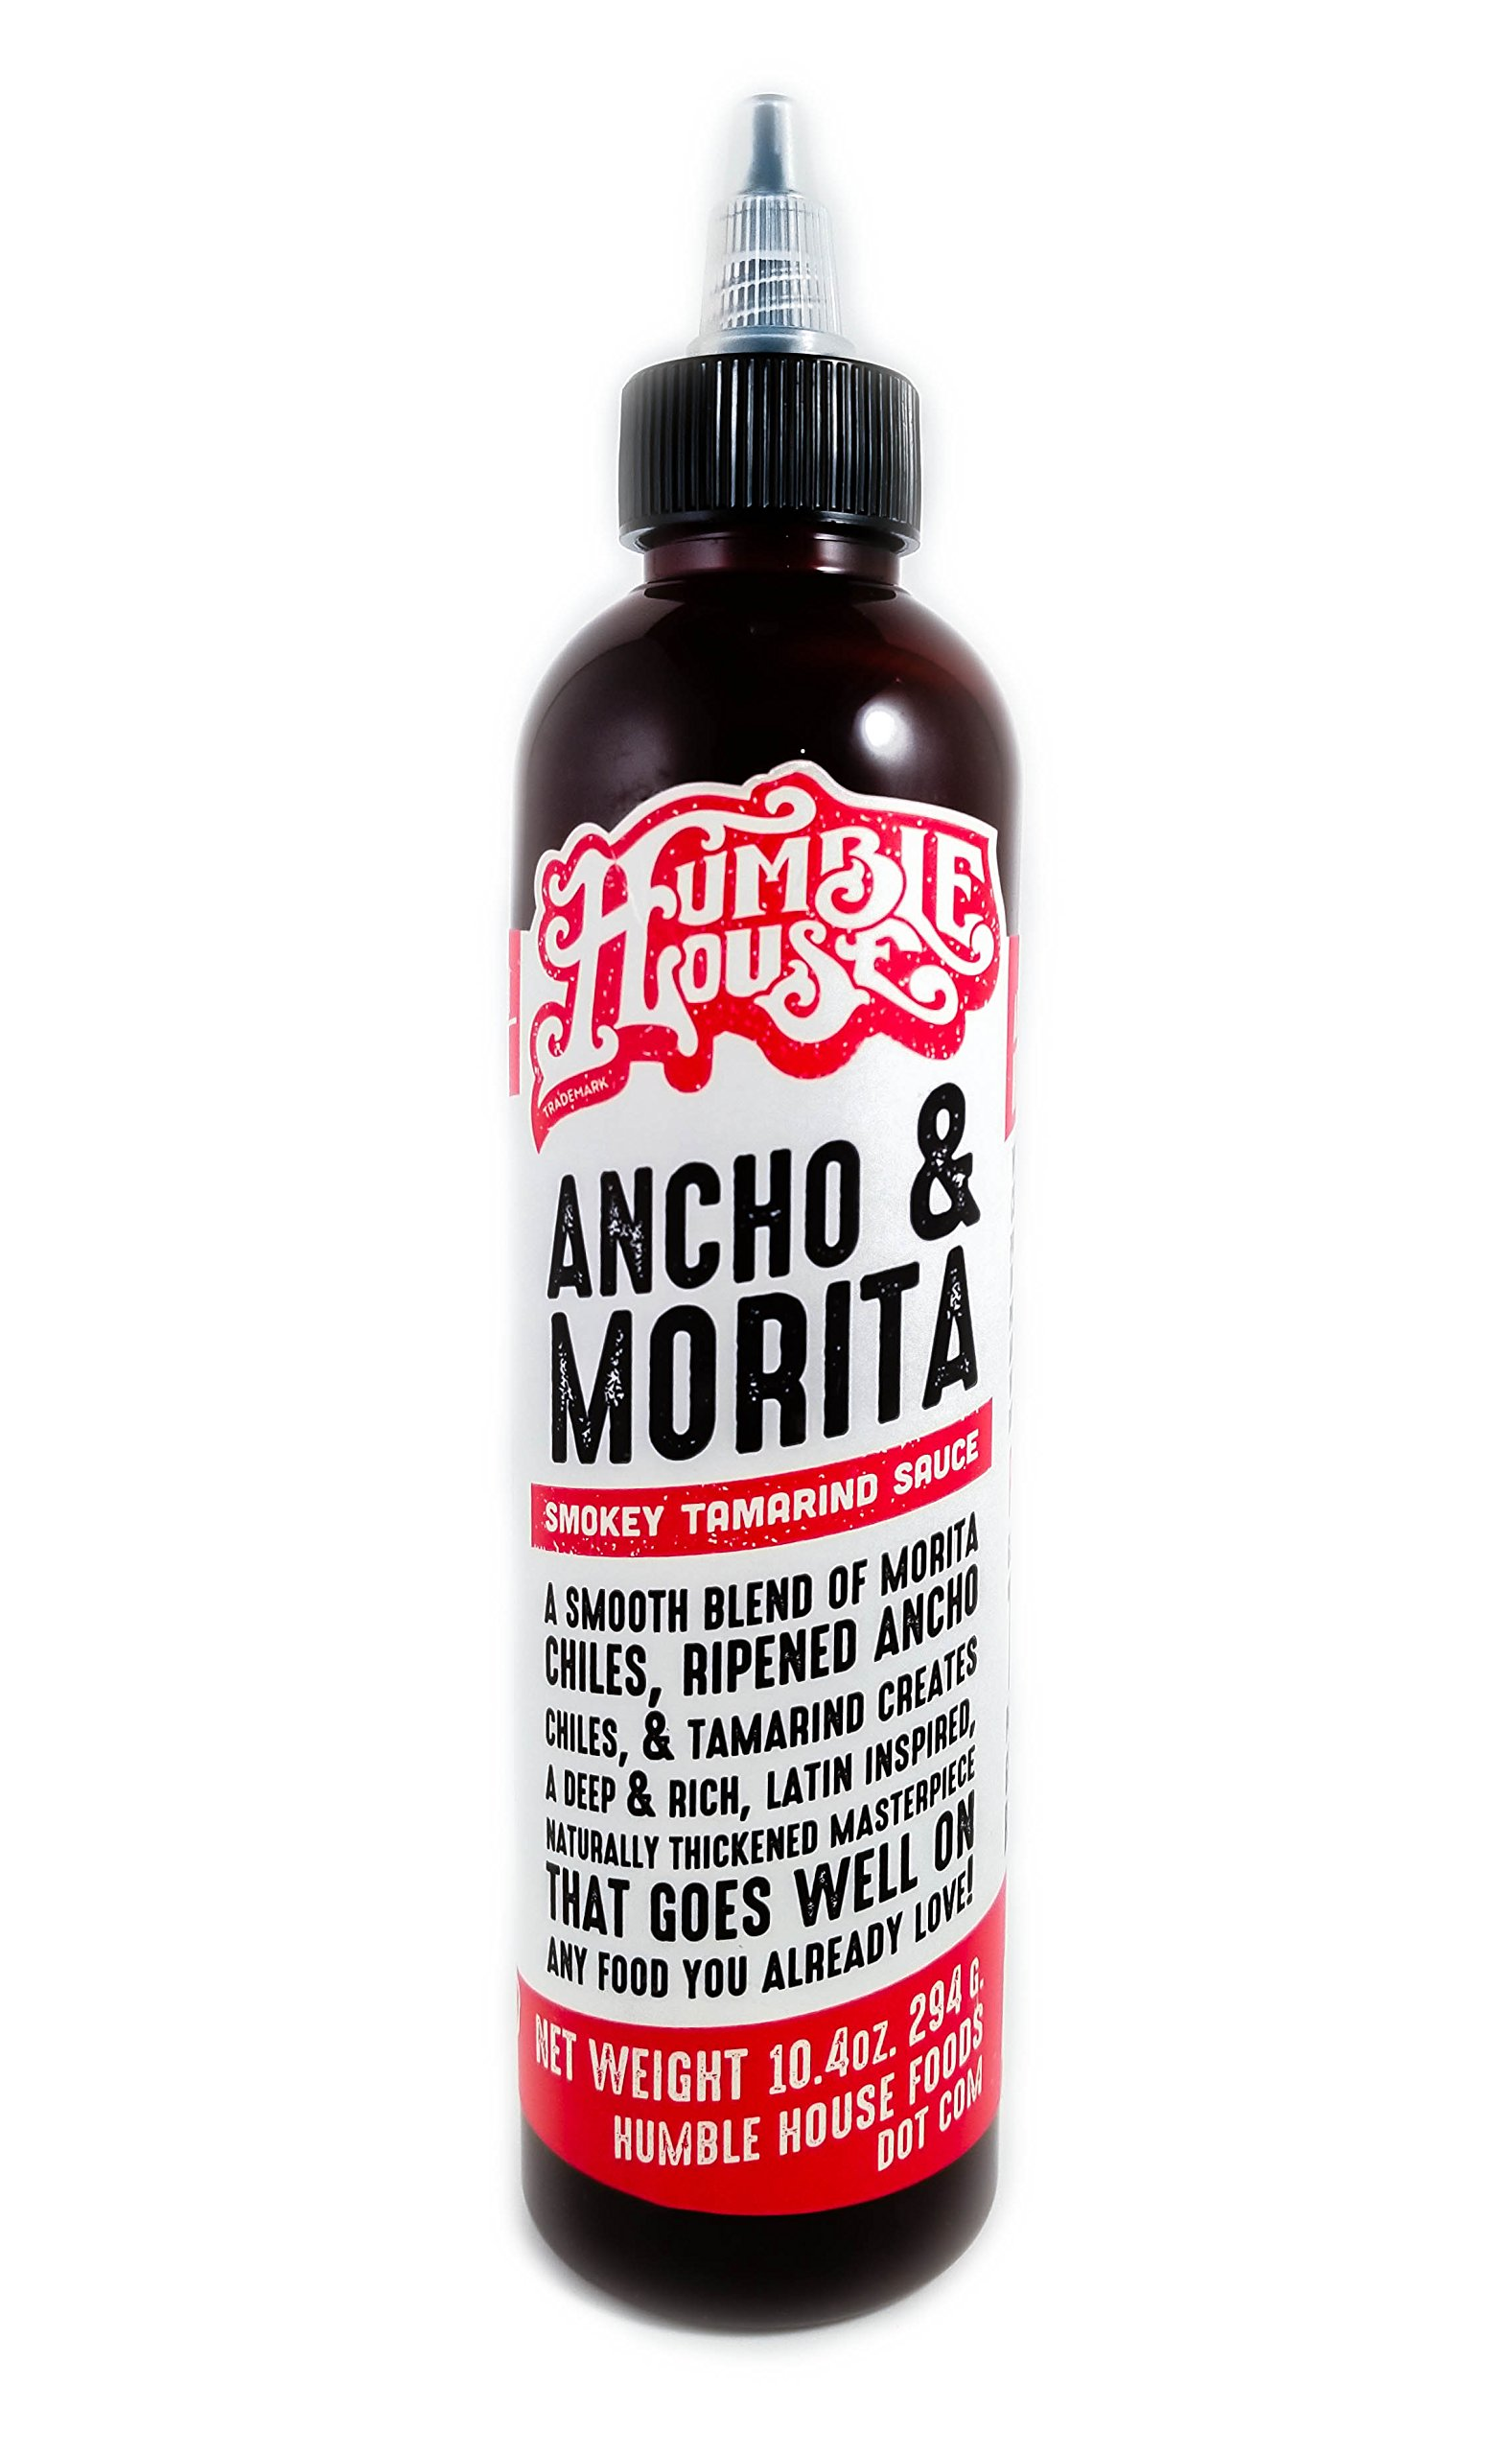 Humble House Ancho and Morita Smokey Sauce   Latin Inspired Tamarind Chile Paste   Natural Vegan & Gluten Free